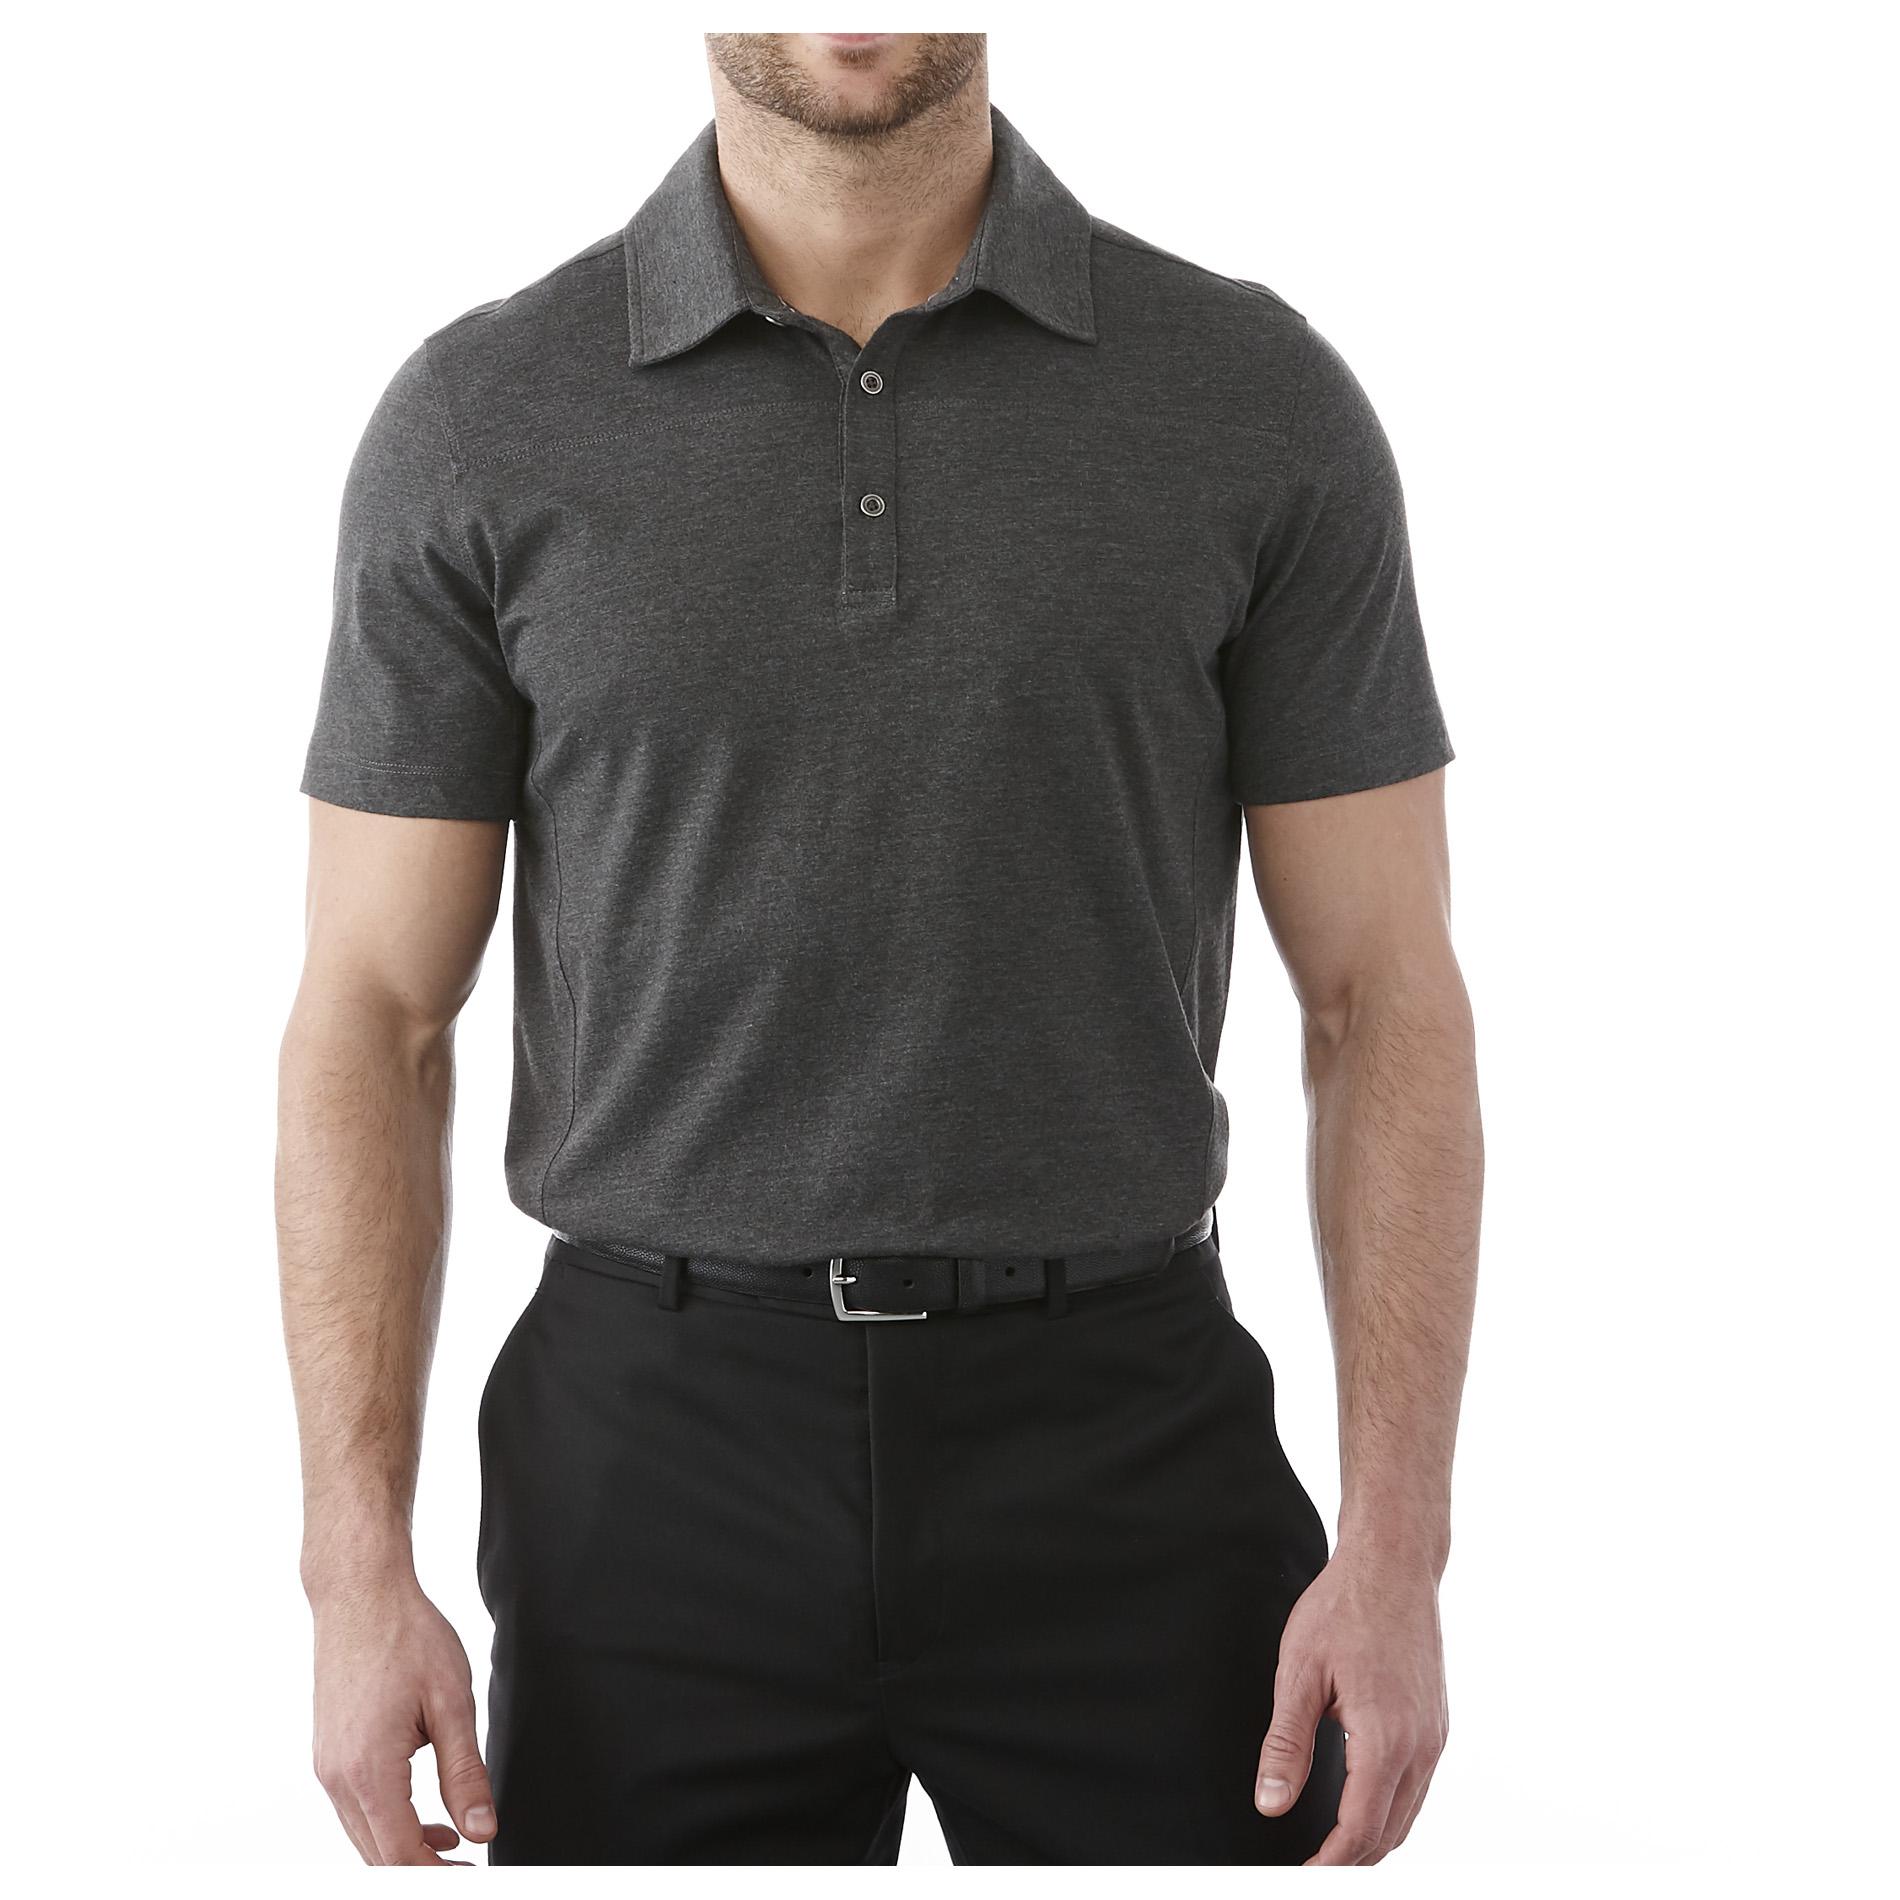 Elevate TM16611 - Men's CONCORD Short Sleeve Polo